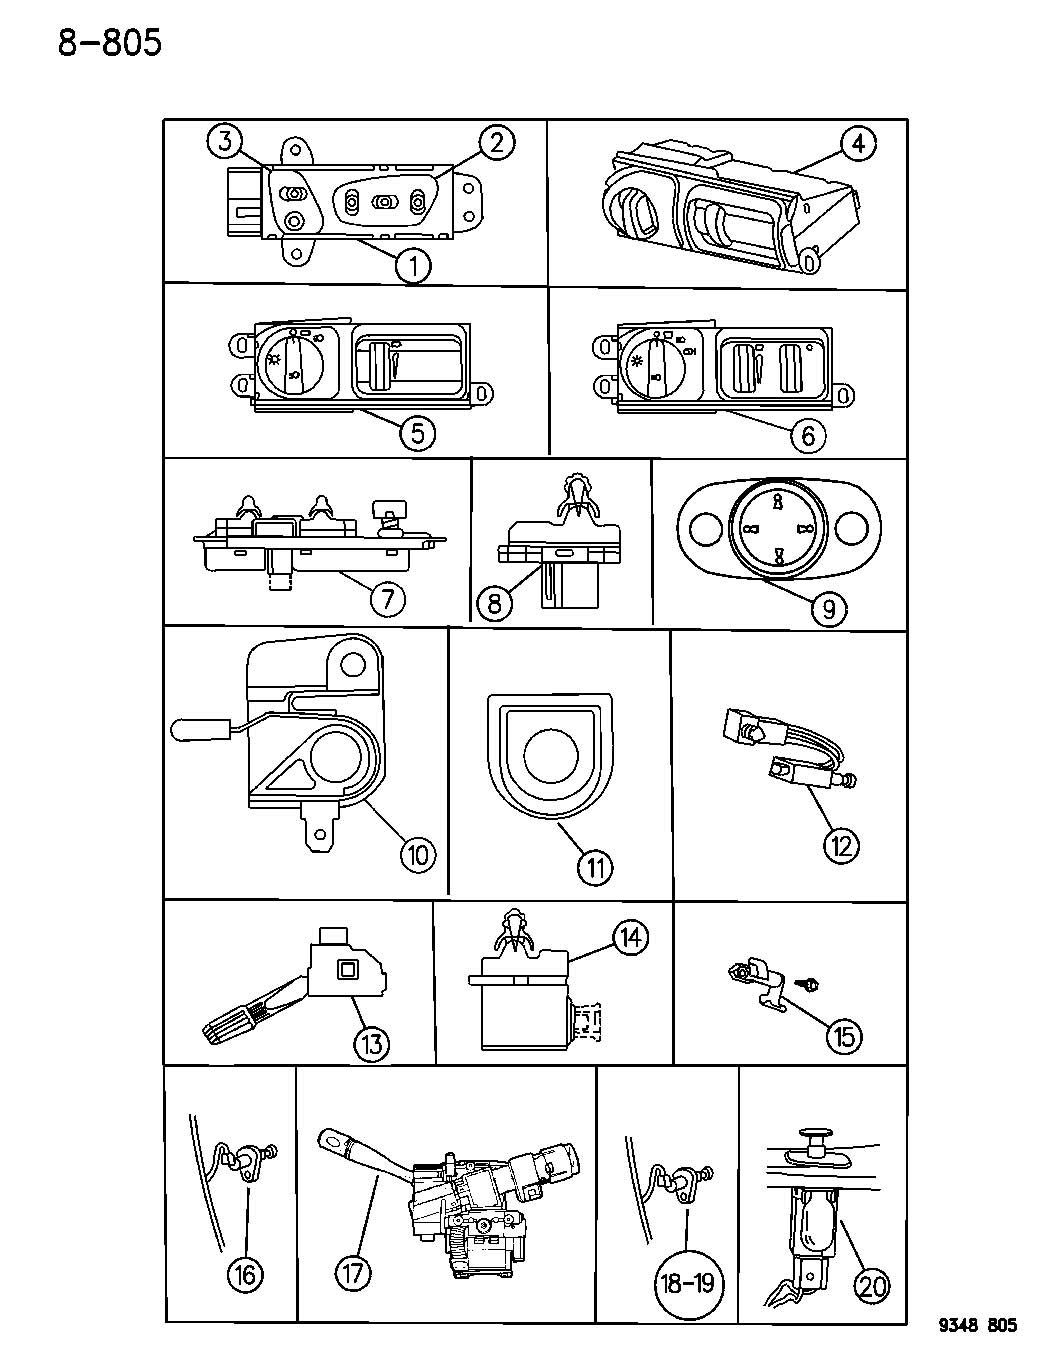 Dodge Intrepid Switch. Security alarm. Disarm. Left